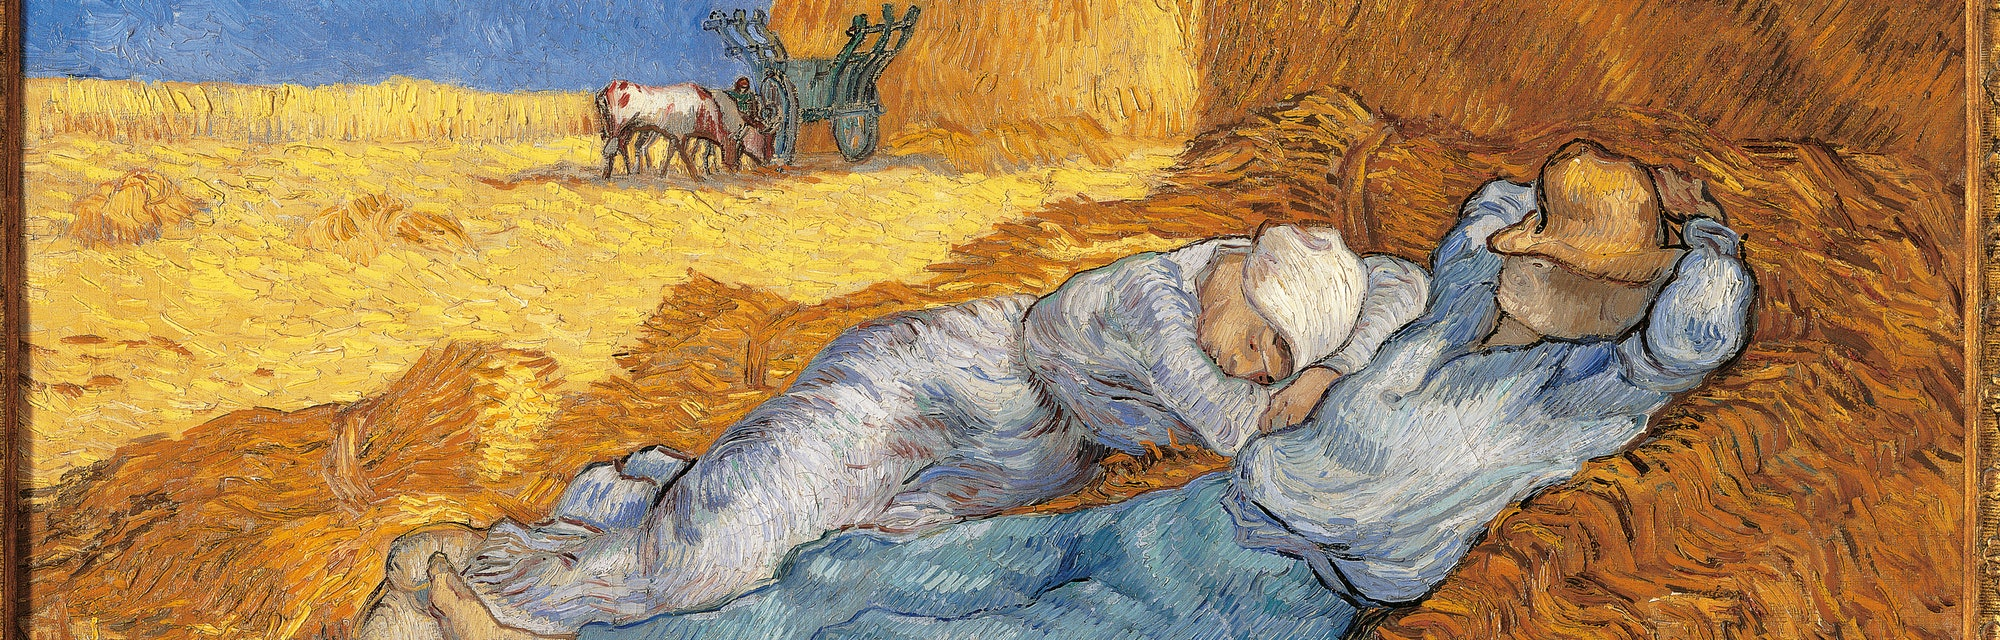 France, Ile de France, Paris, Muse dOrsay, RF1952-17. Whole artwork view. Sheaf sleeping yellow azur...